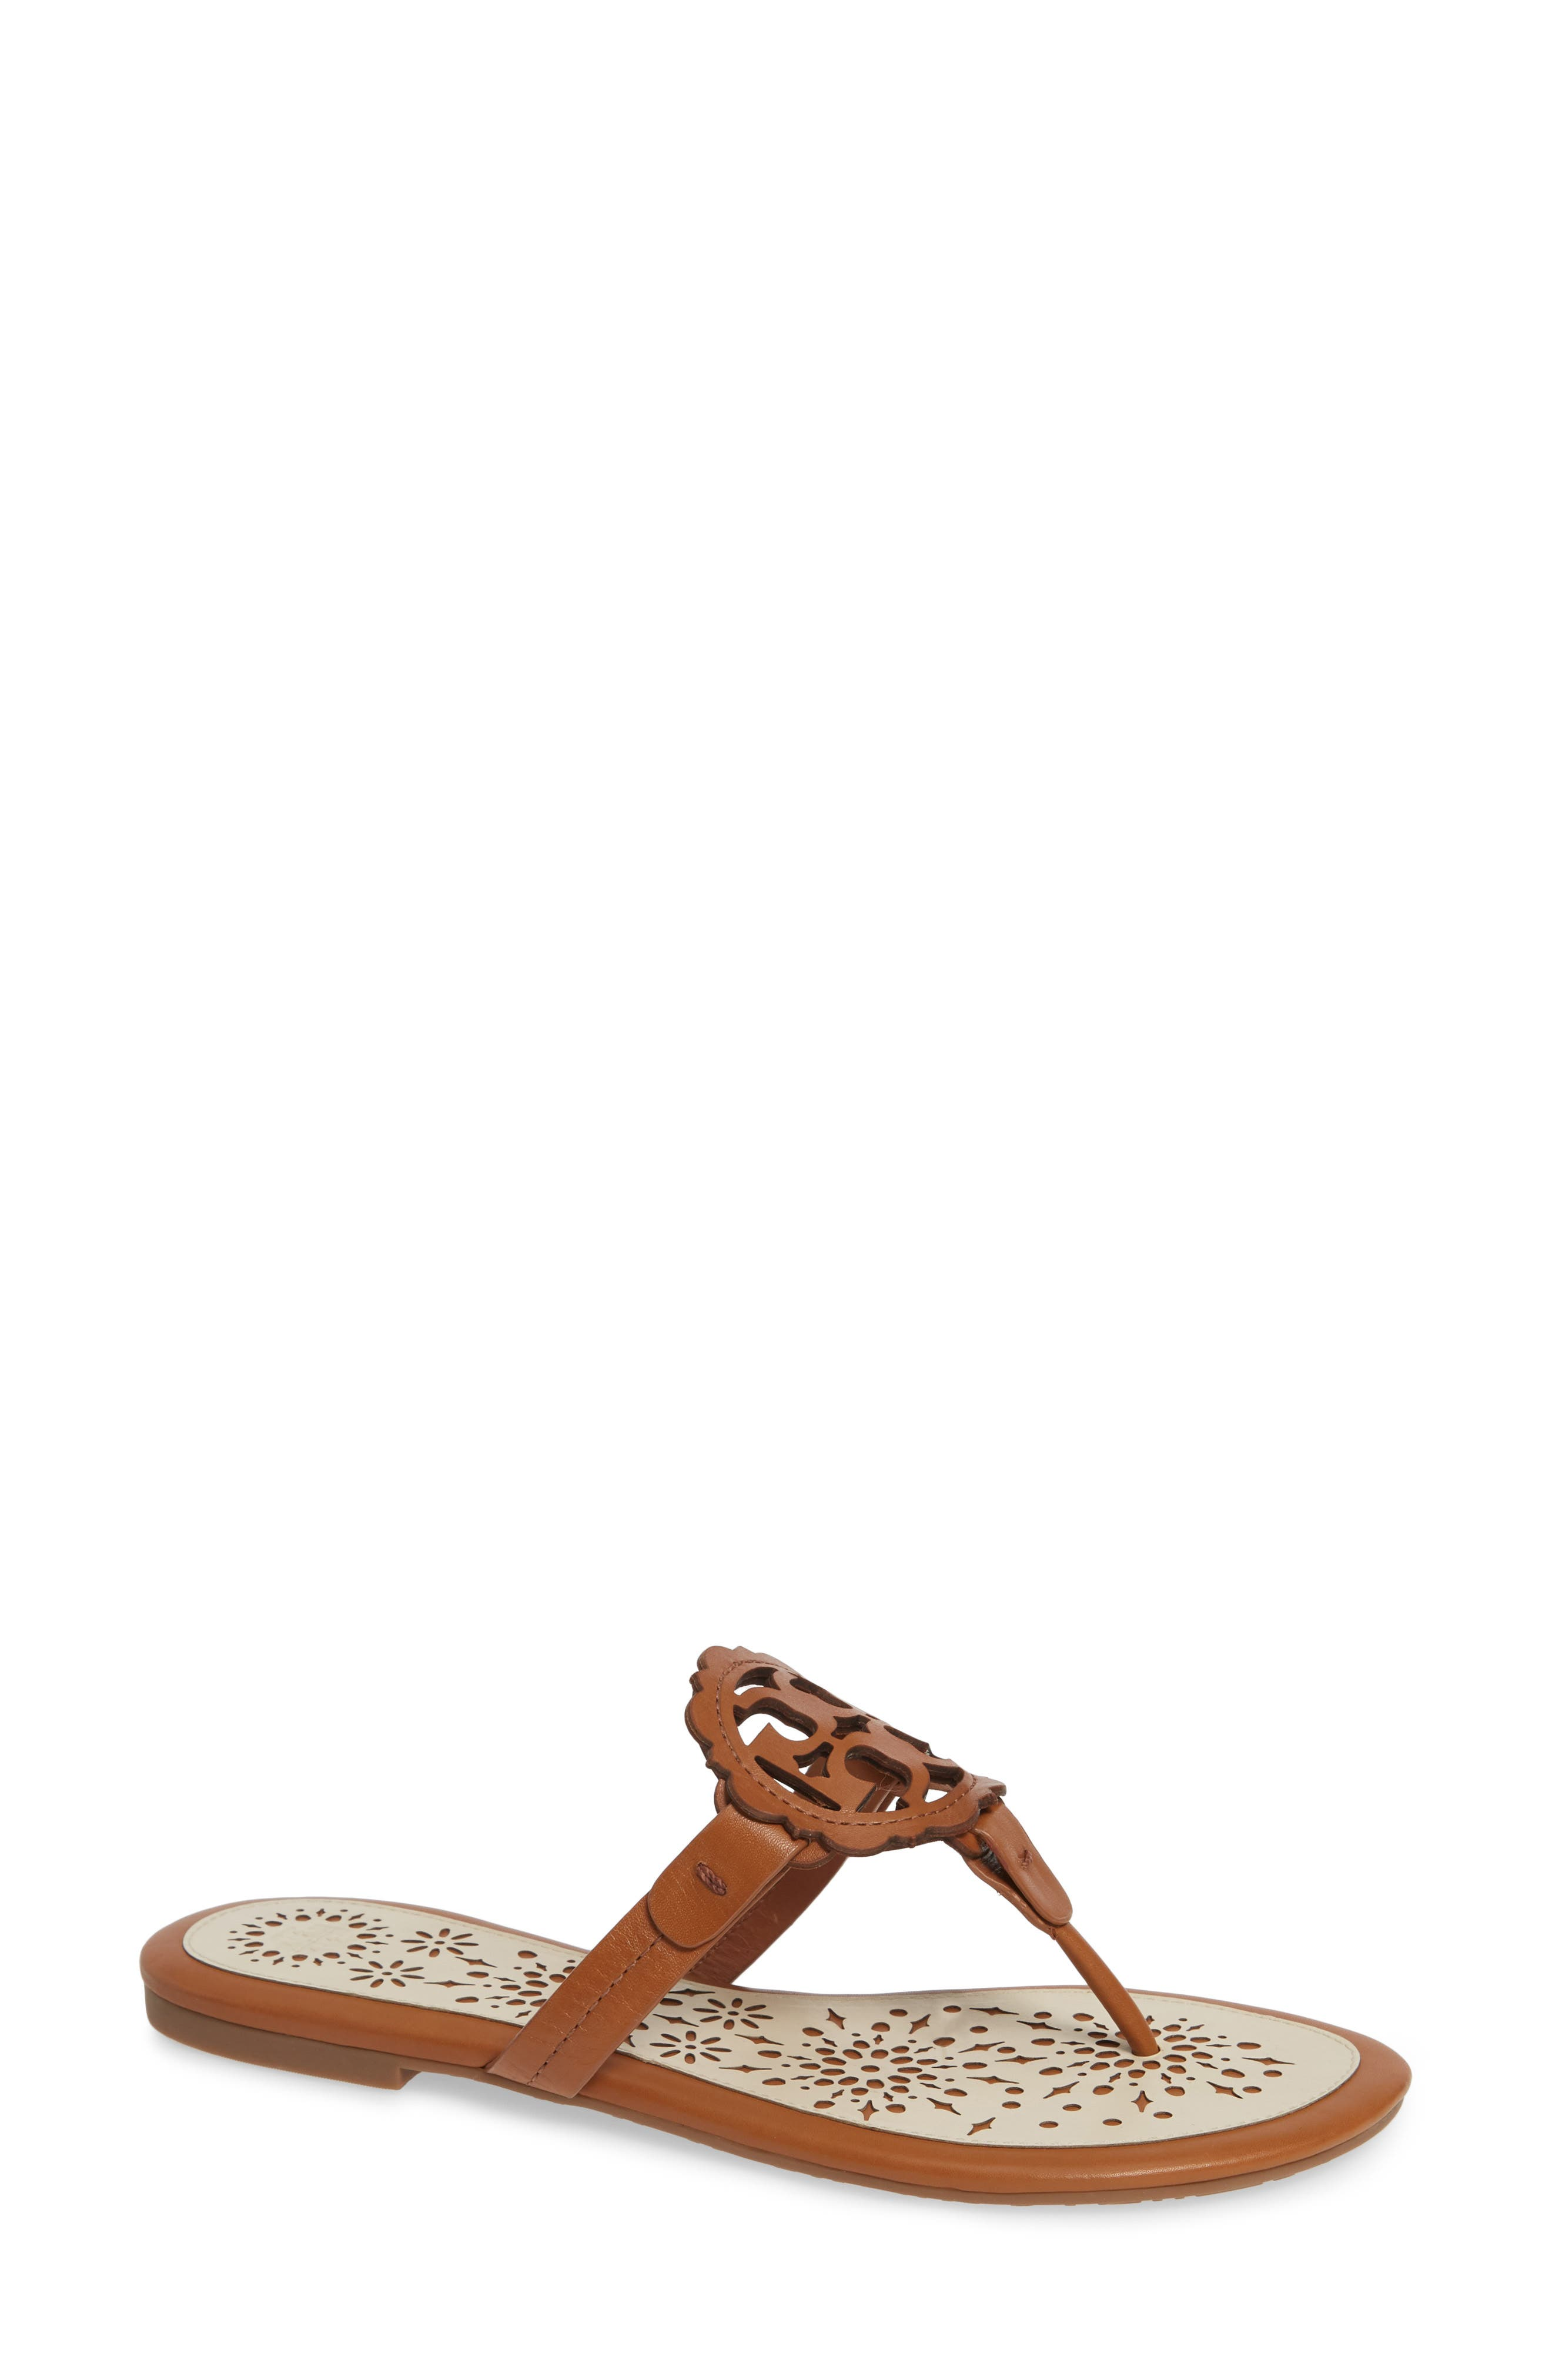 TORY BURCH Miller Scalloped Medallion Sandal, Main, color, TAN/ NEW CREAM